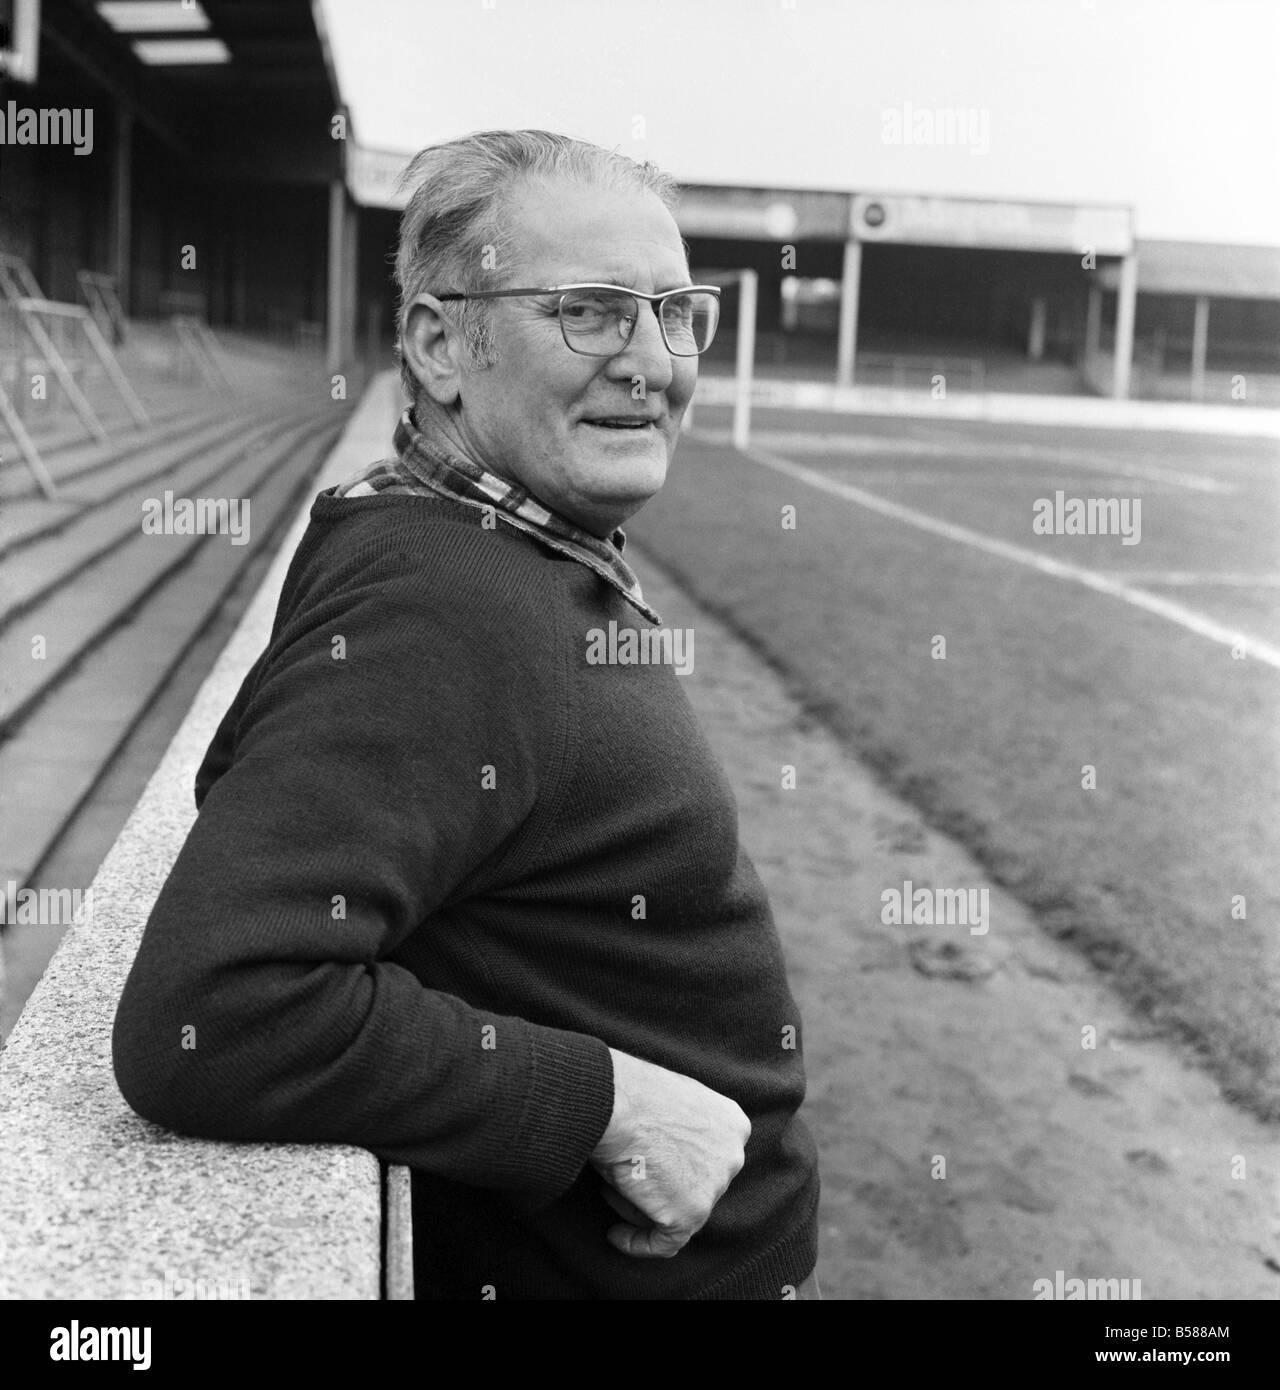 Old man/Grounds man/Humour. January 1975 75-00466-002 - Stock Image